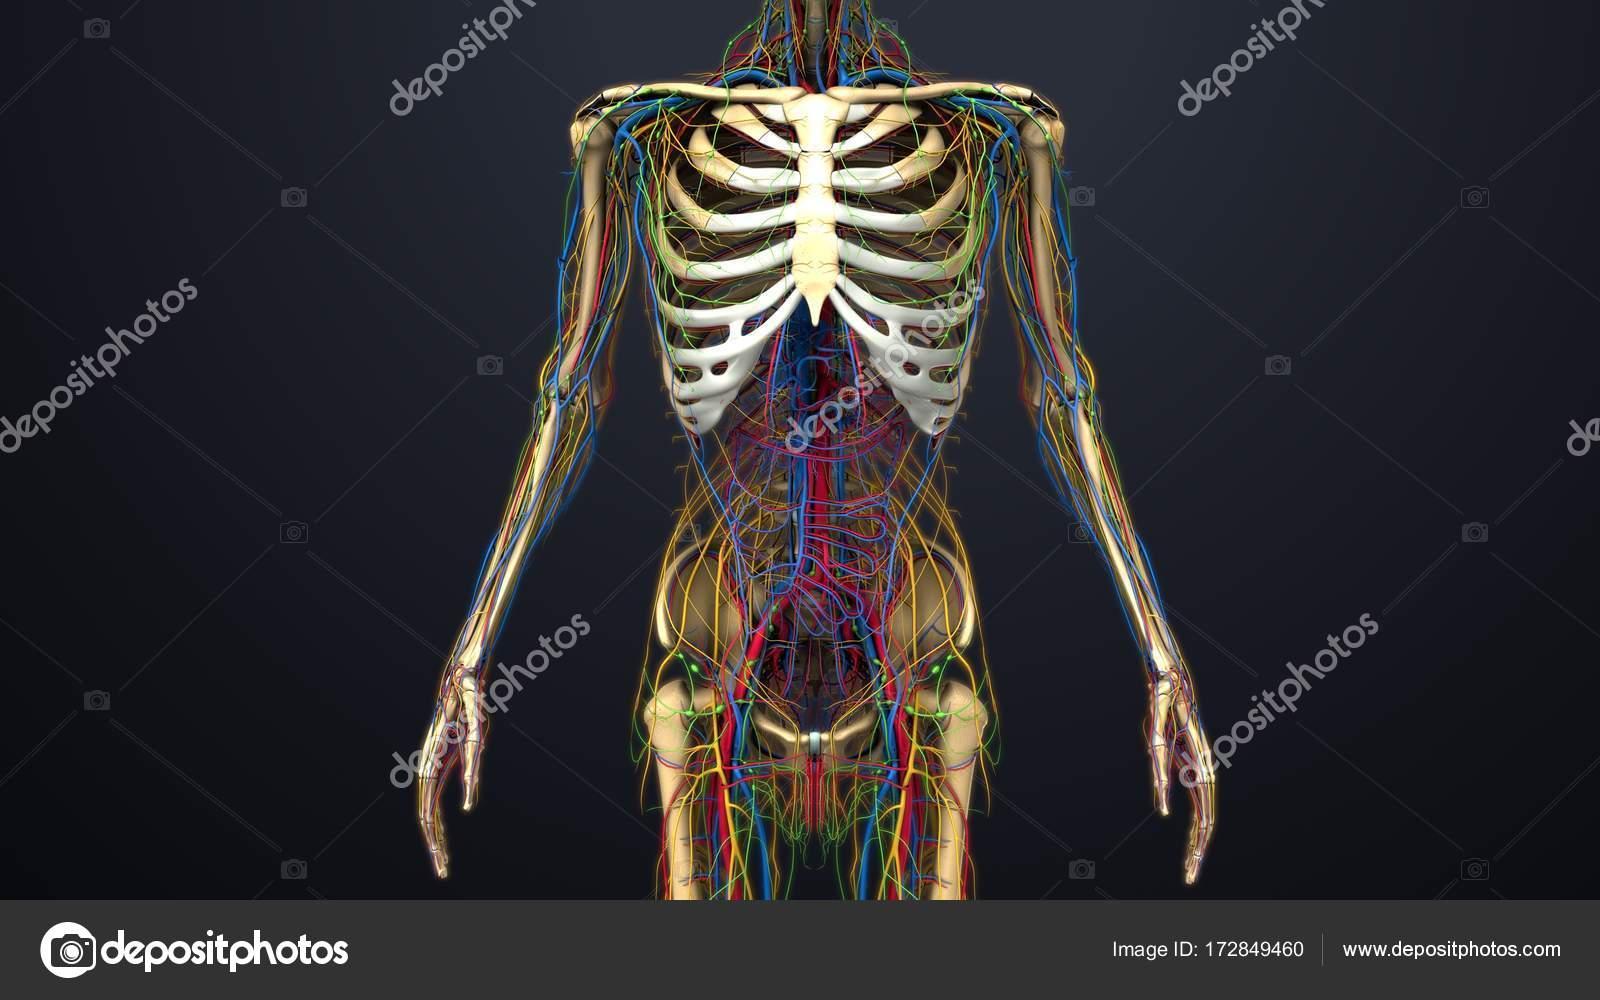 Nervensystem mit Lymphknoten — Stockfoto © sciencepics #172849460